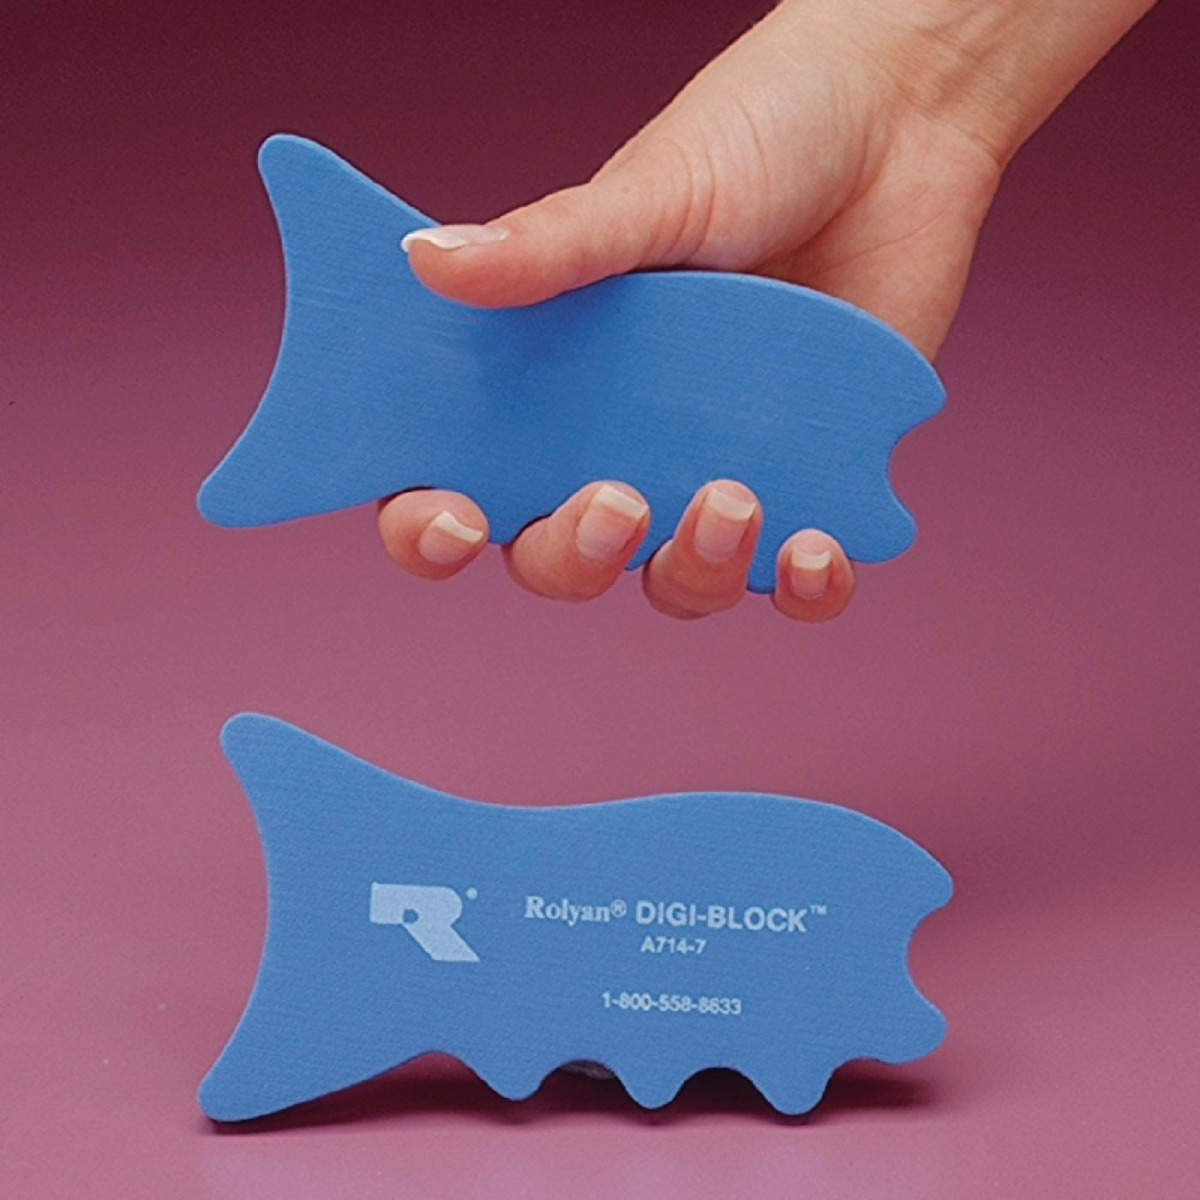 Rolyan Digi-Blocks Hand Exerciser